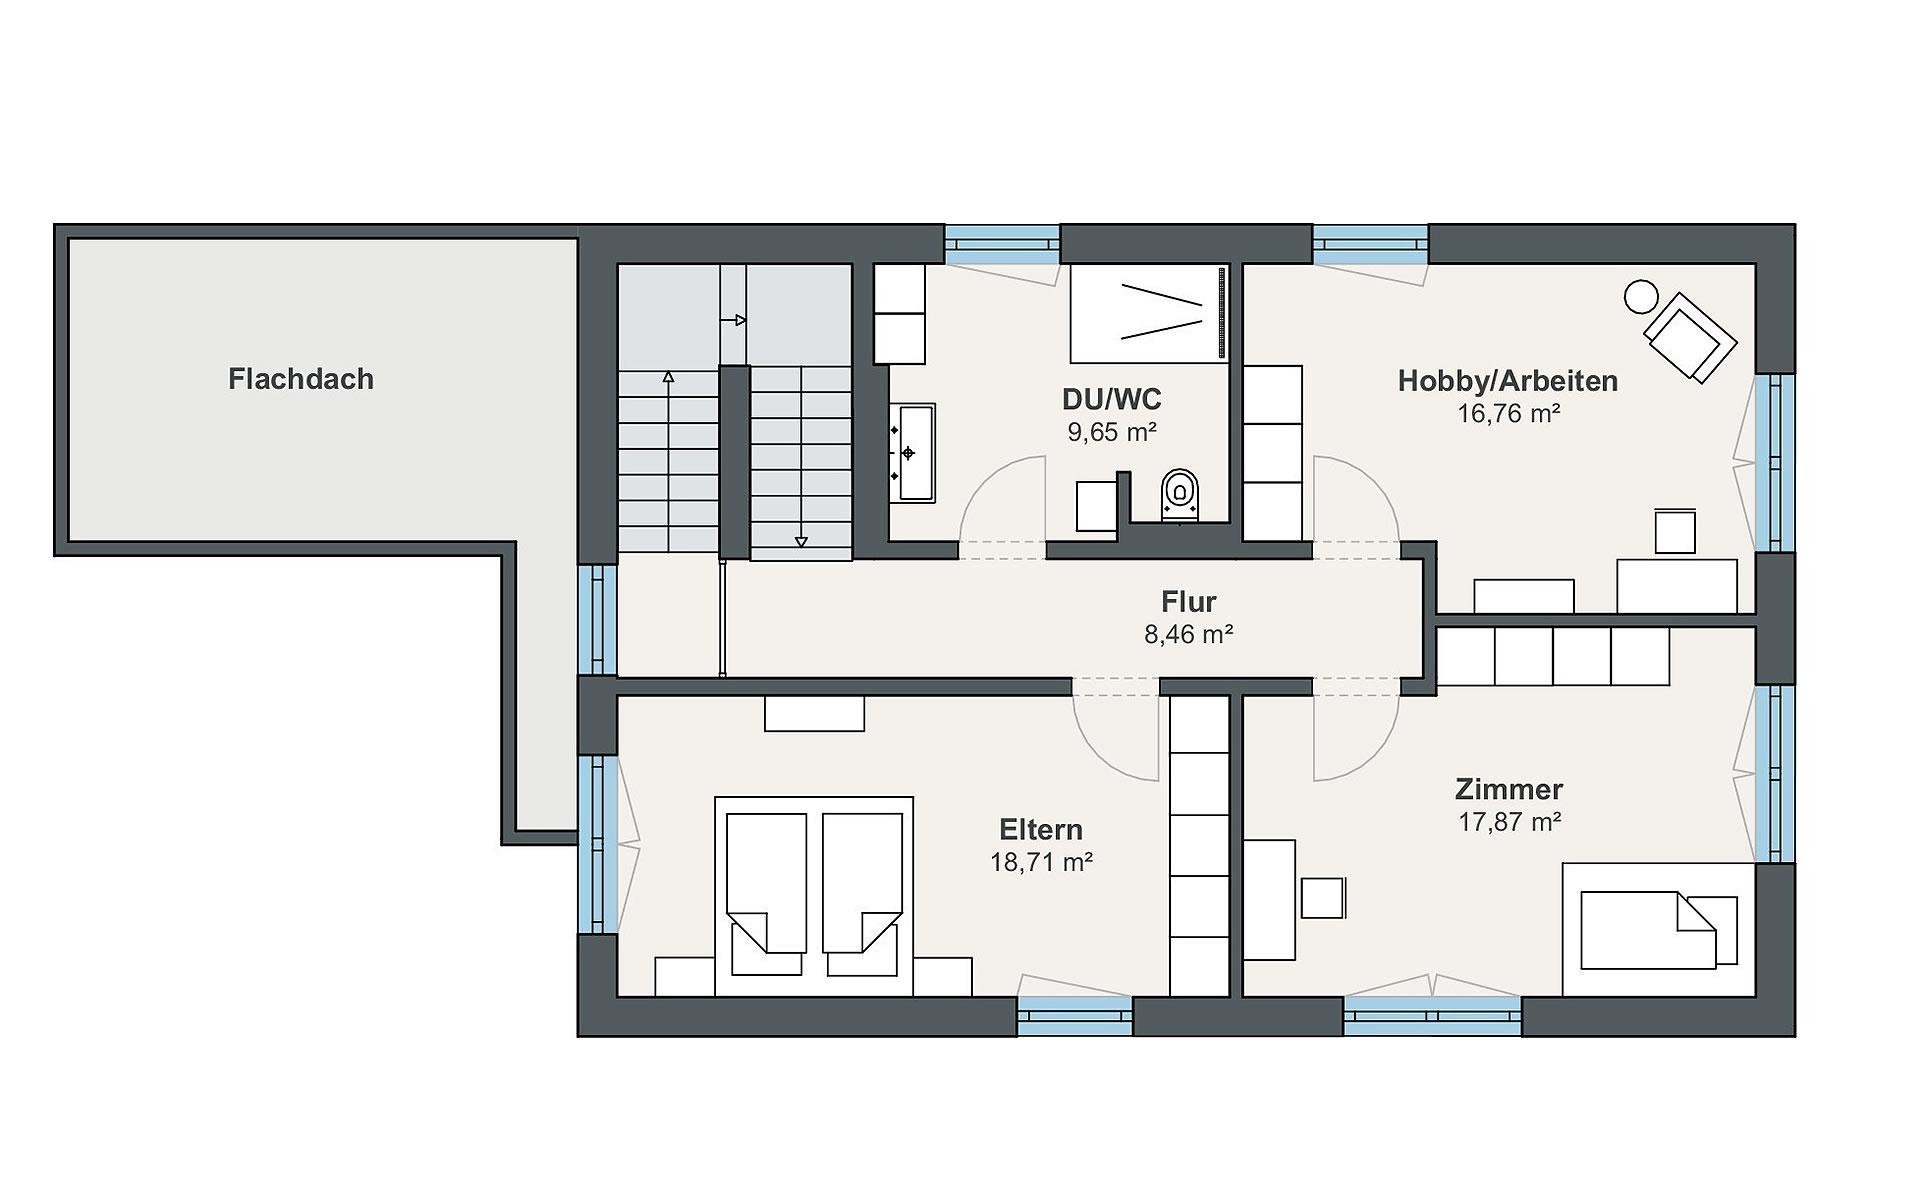 Dachgeschoss Musterhaus Rheinau-Linx (sunshine) von WeberHaus GmbH & Co. KG